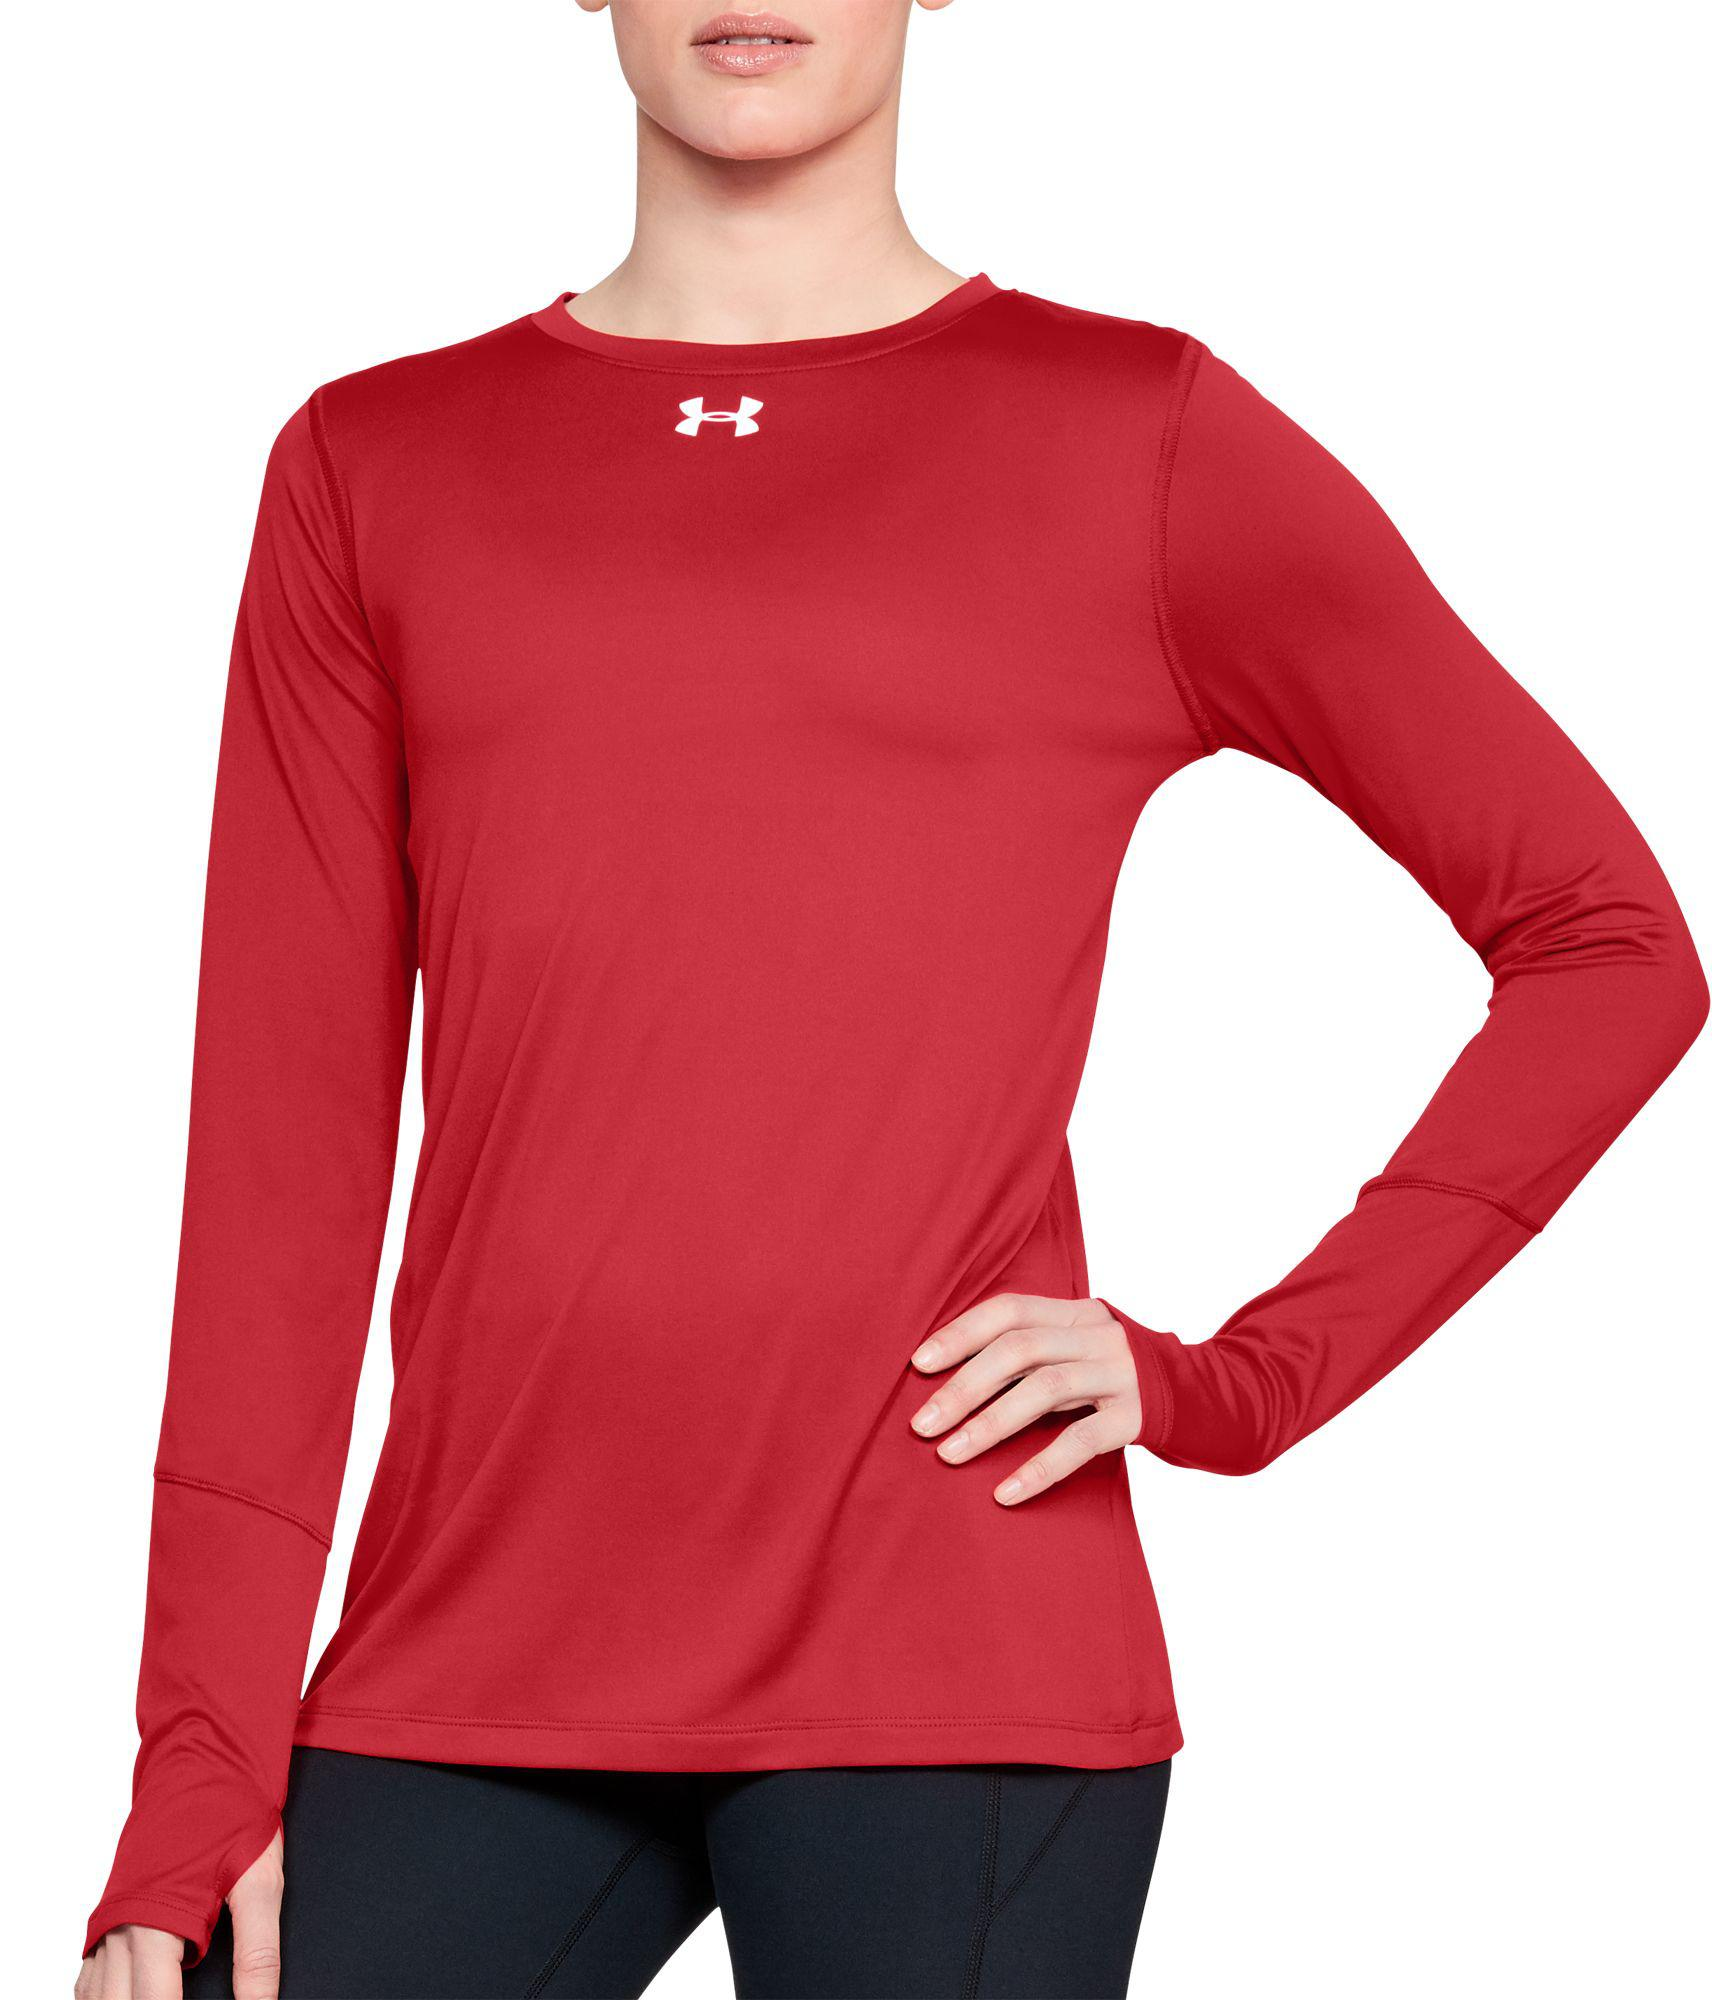 87fc0e03d91a Lyst - Under Armour Locker 2.0 Long Sleeve Shirt in Red